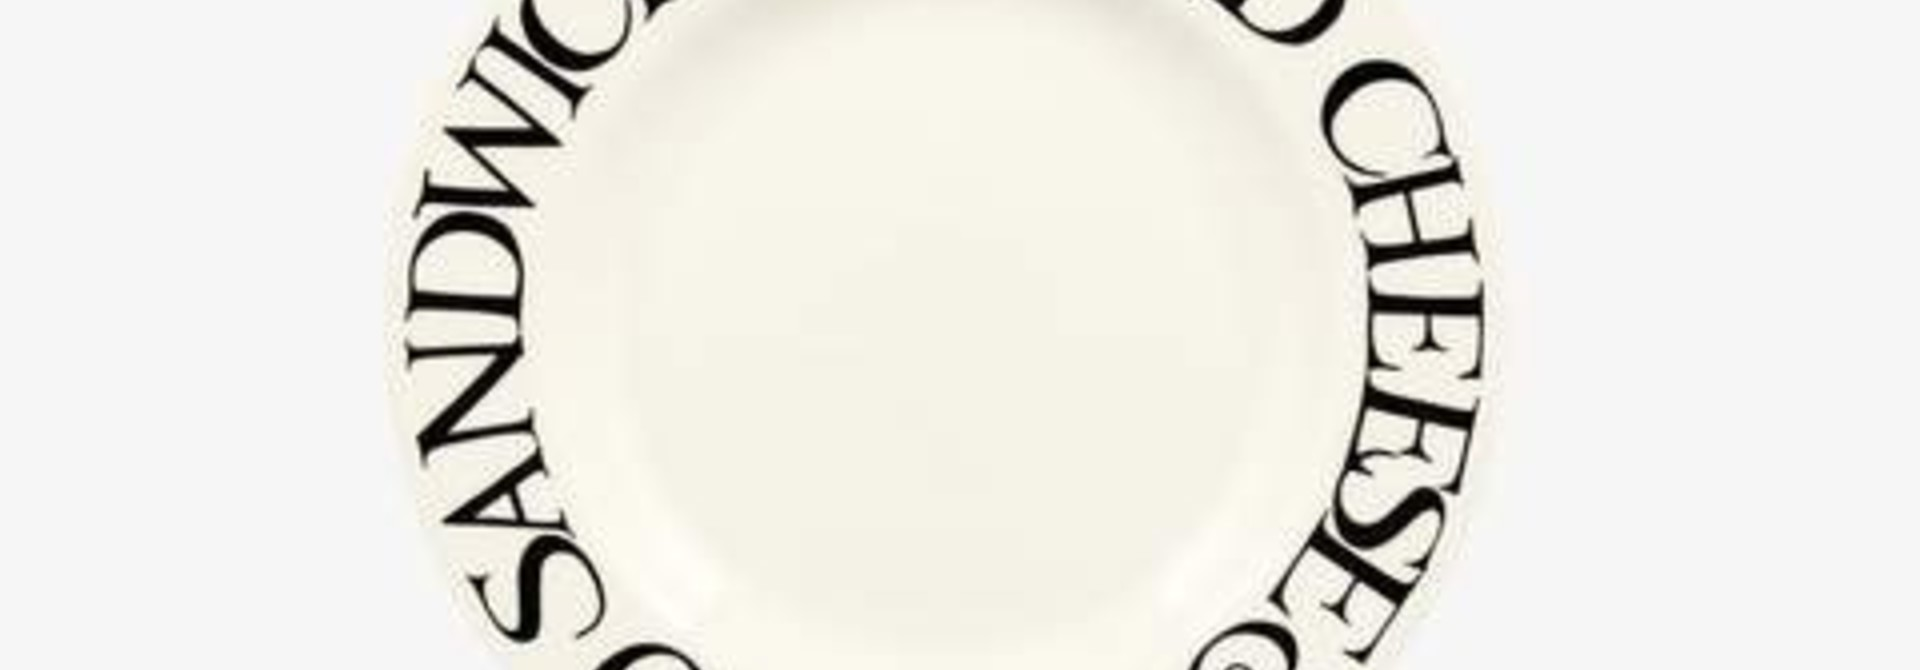 "Black Toast - Cheese & Tomato Plate - 6.5"""